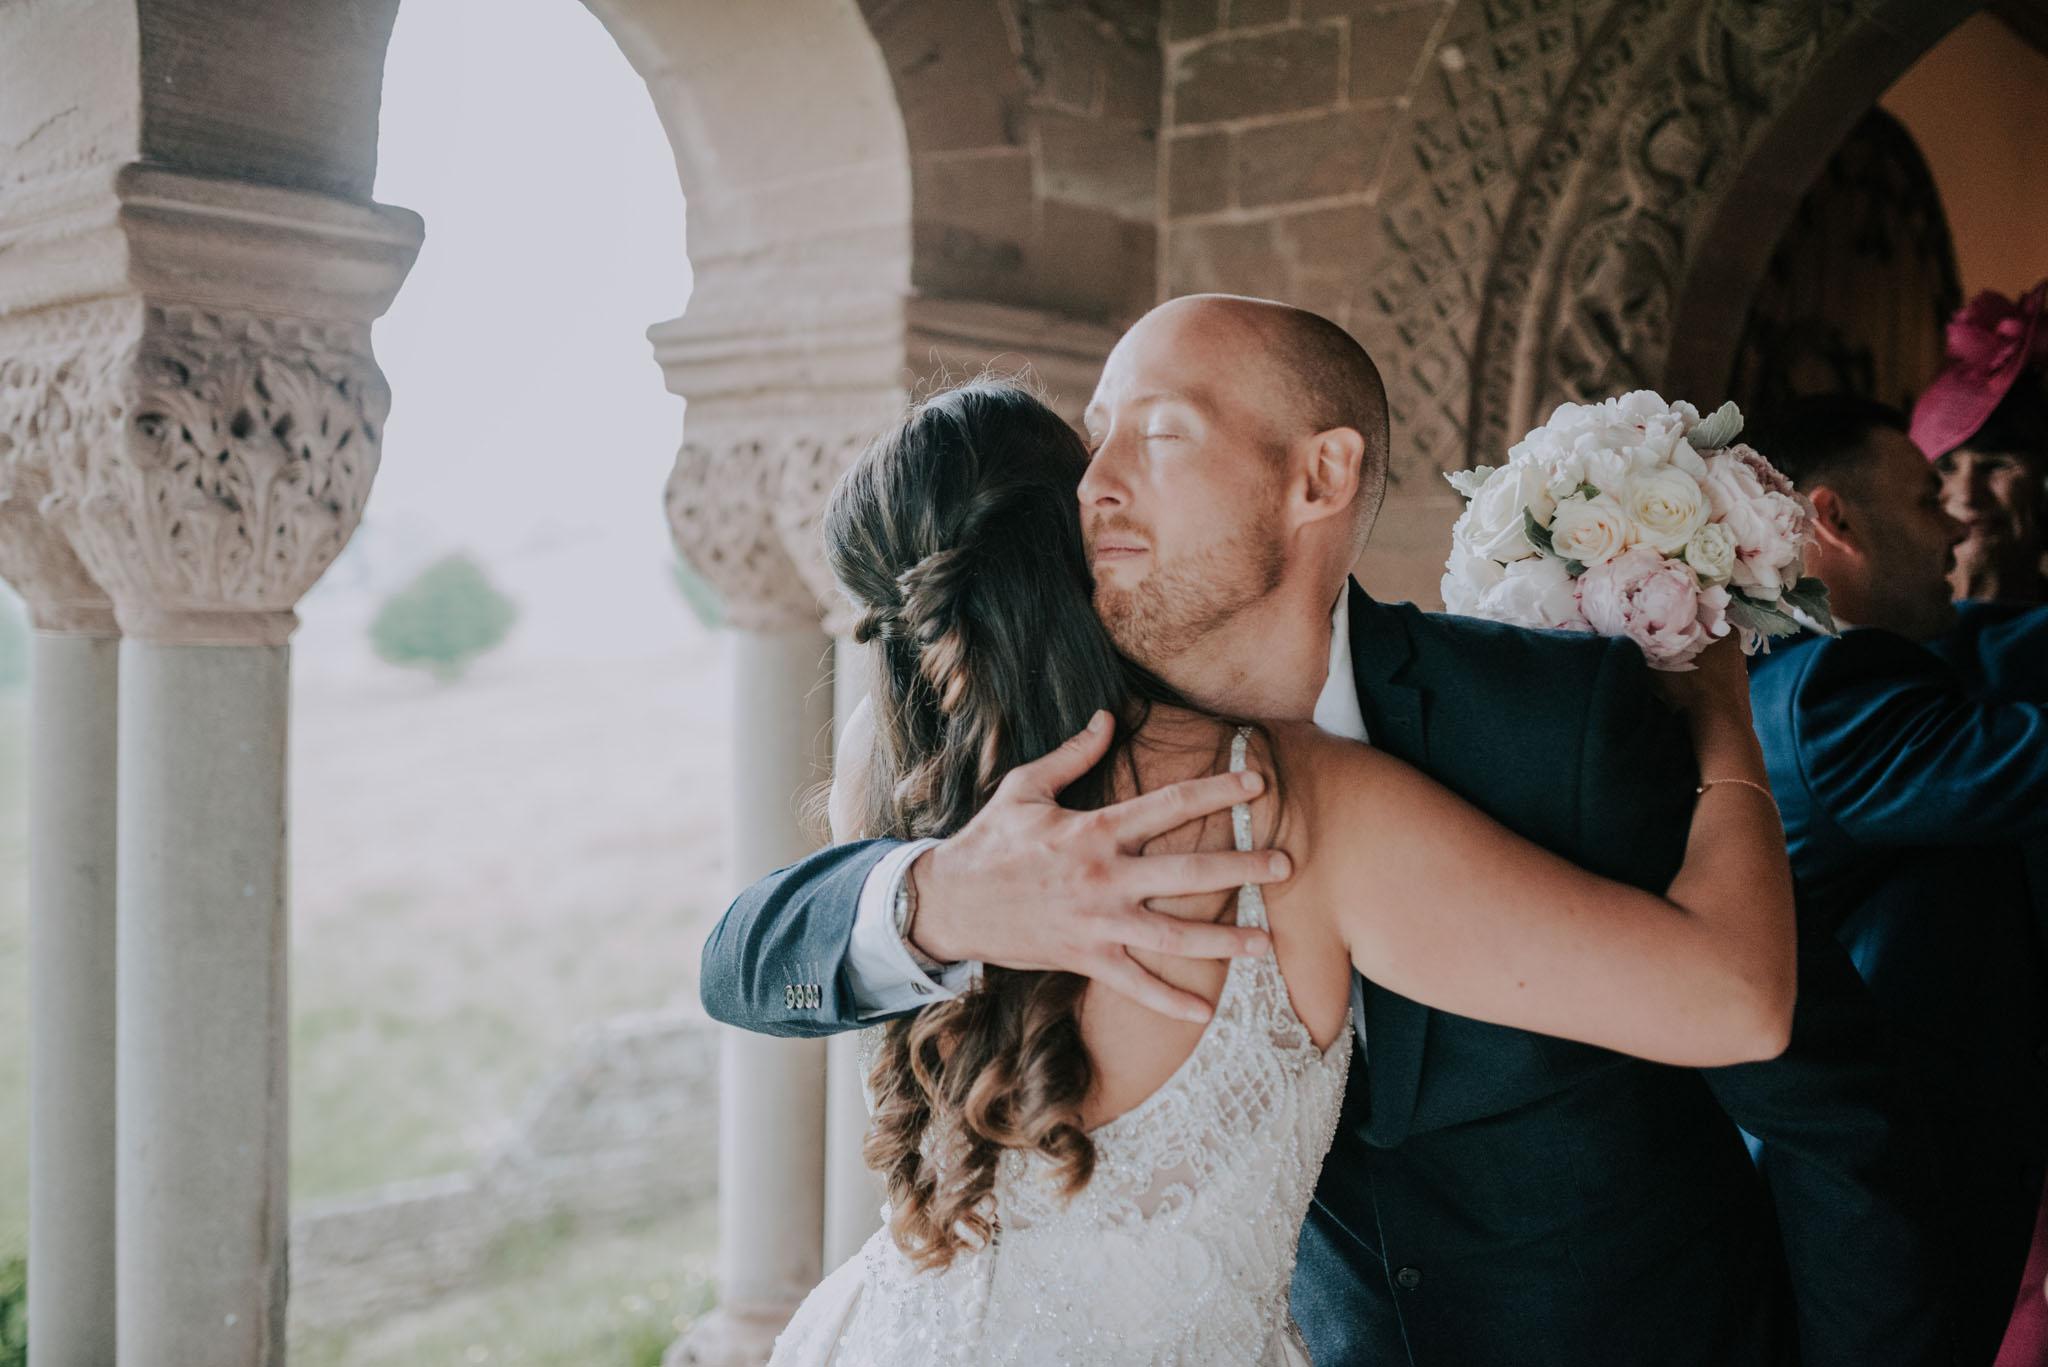 wedding-photographer-glewstone-court-hereford-scott-stockwell-photography251.jpg